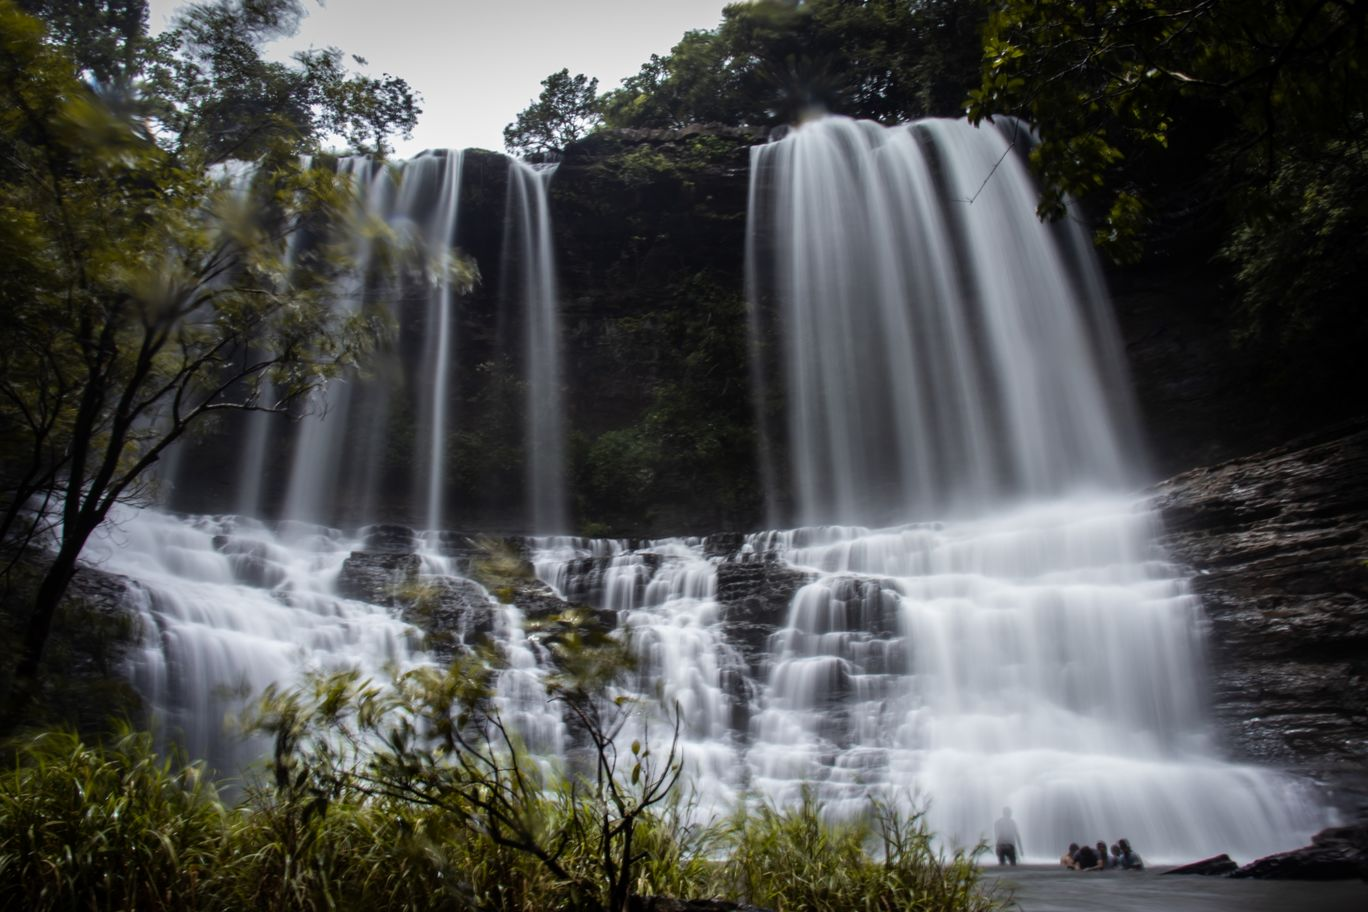 Photo of Sawatsada Waterfall By Shubham Raut